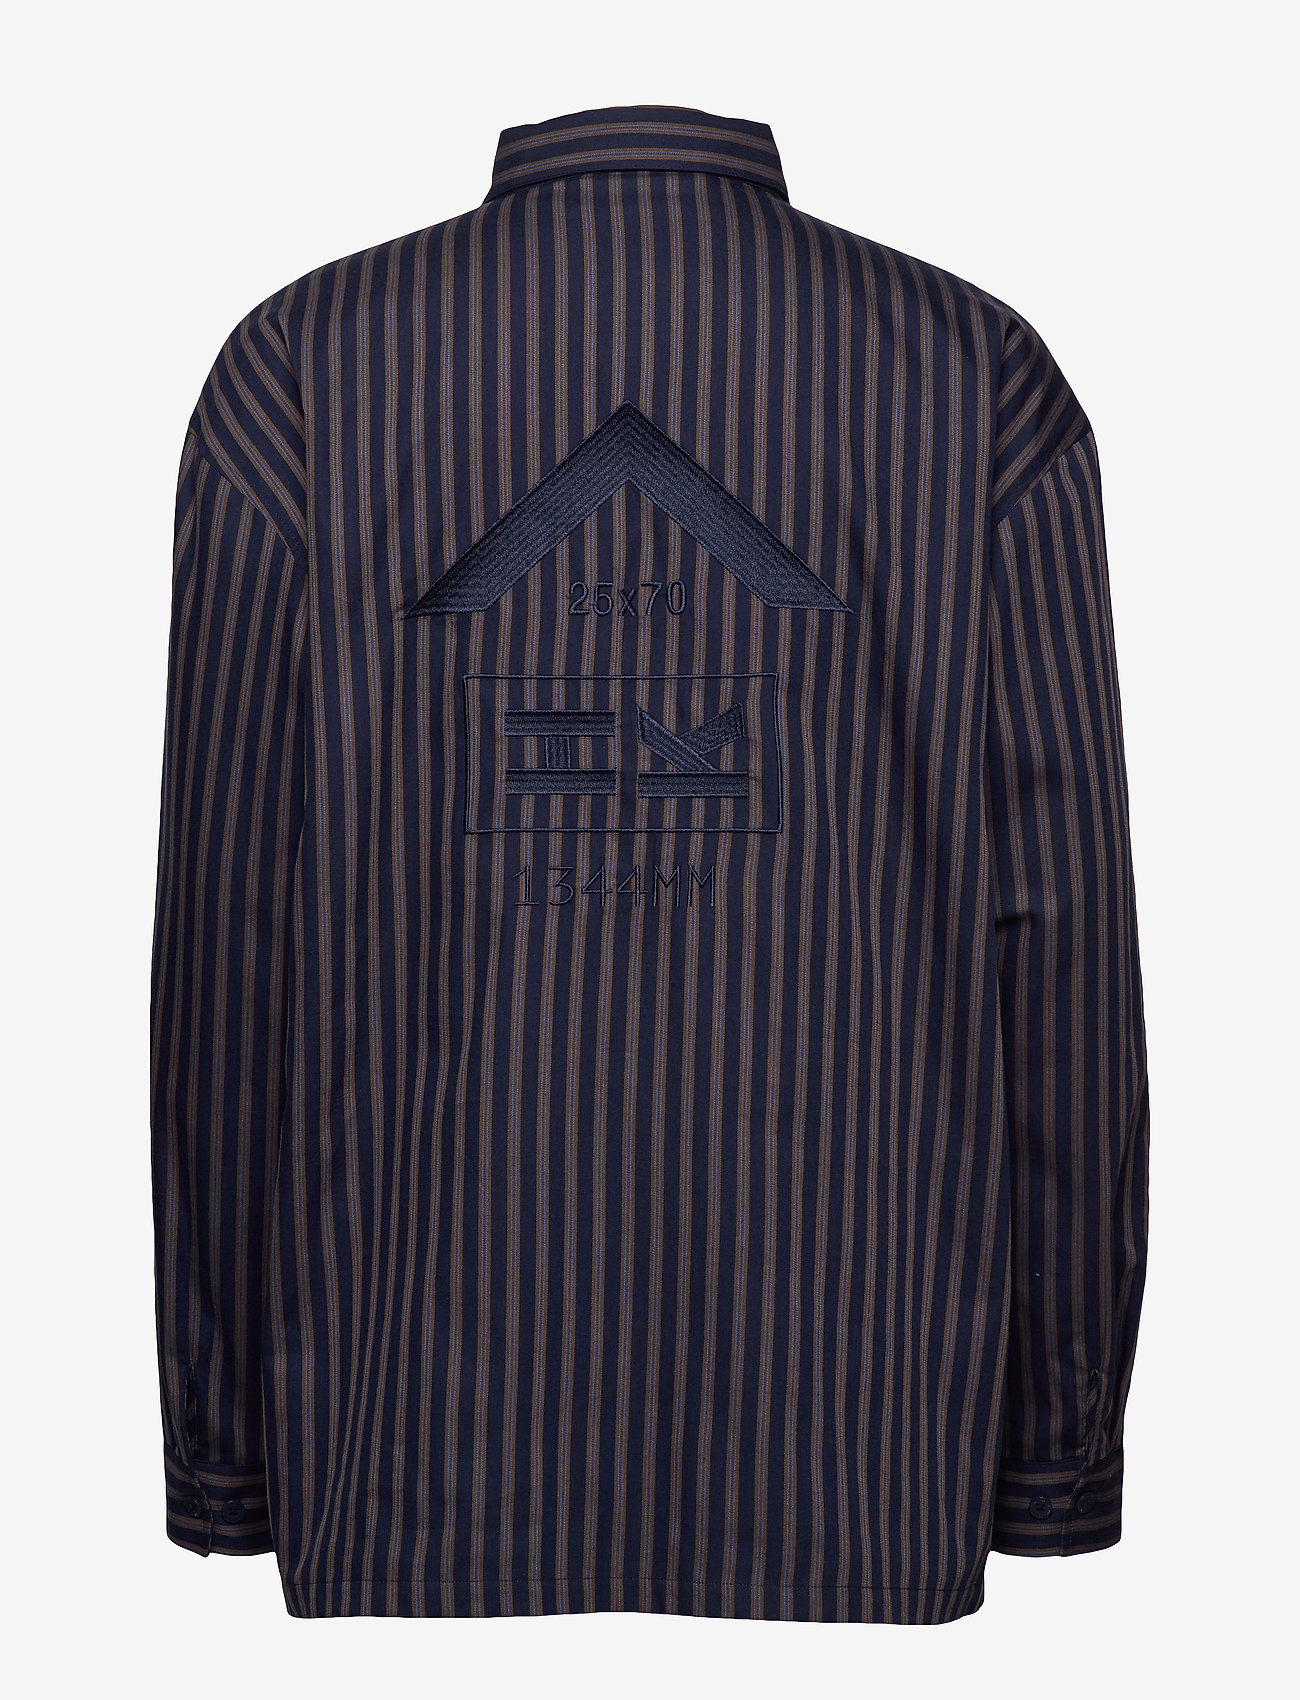 HAN Kjøbenhavn - Shirt Jacket - tops - navy stripe - 1